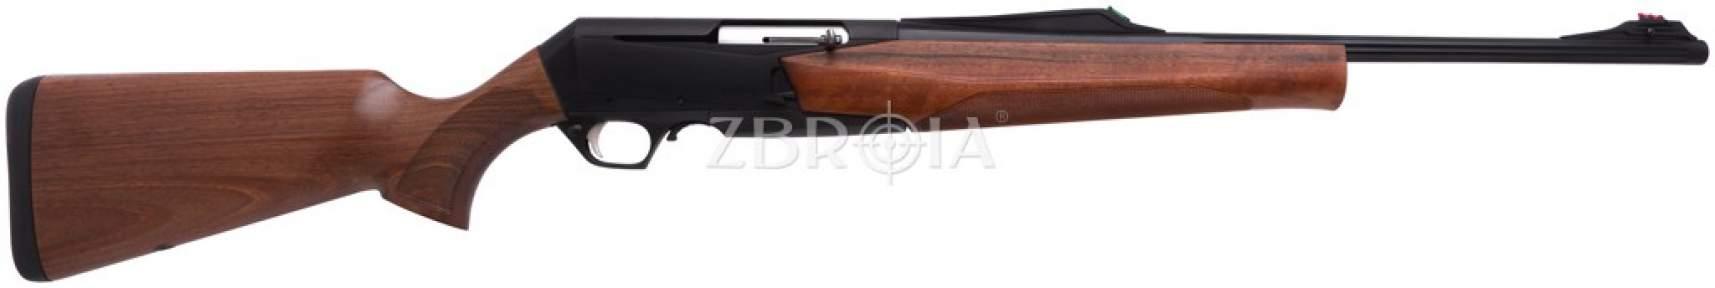 Карабин Browning BAR MK3 Hunter Fluted кал. 30-06